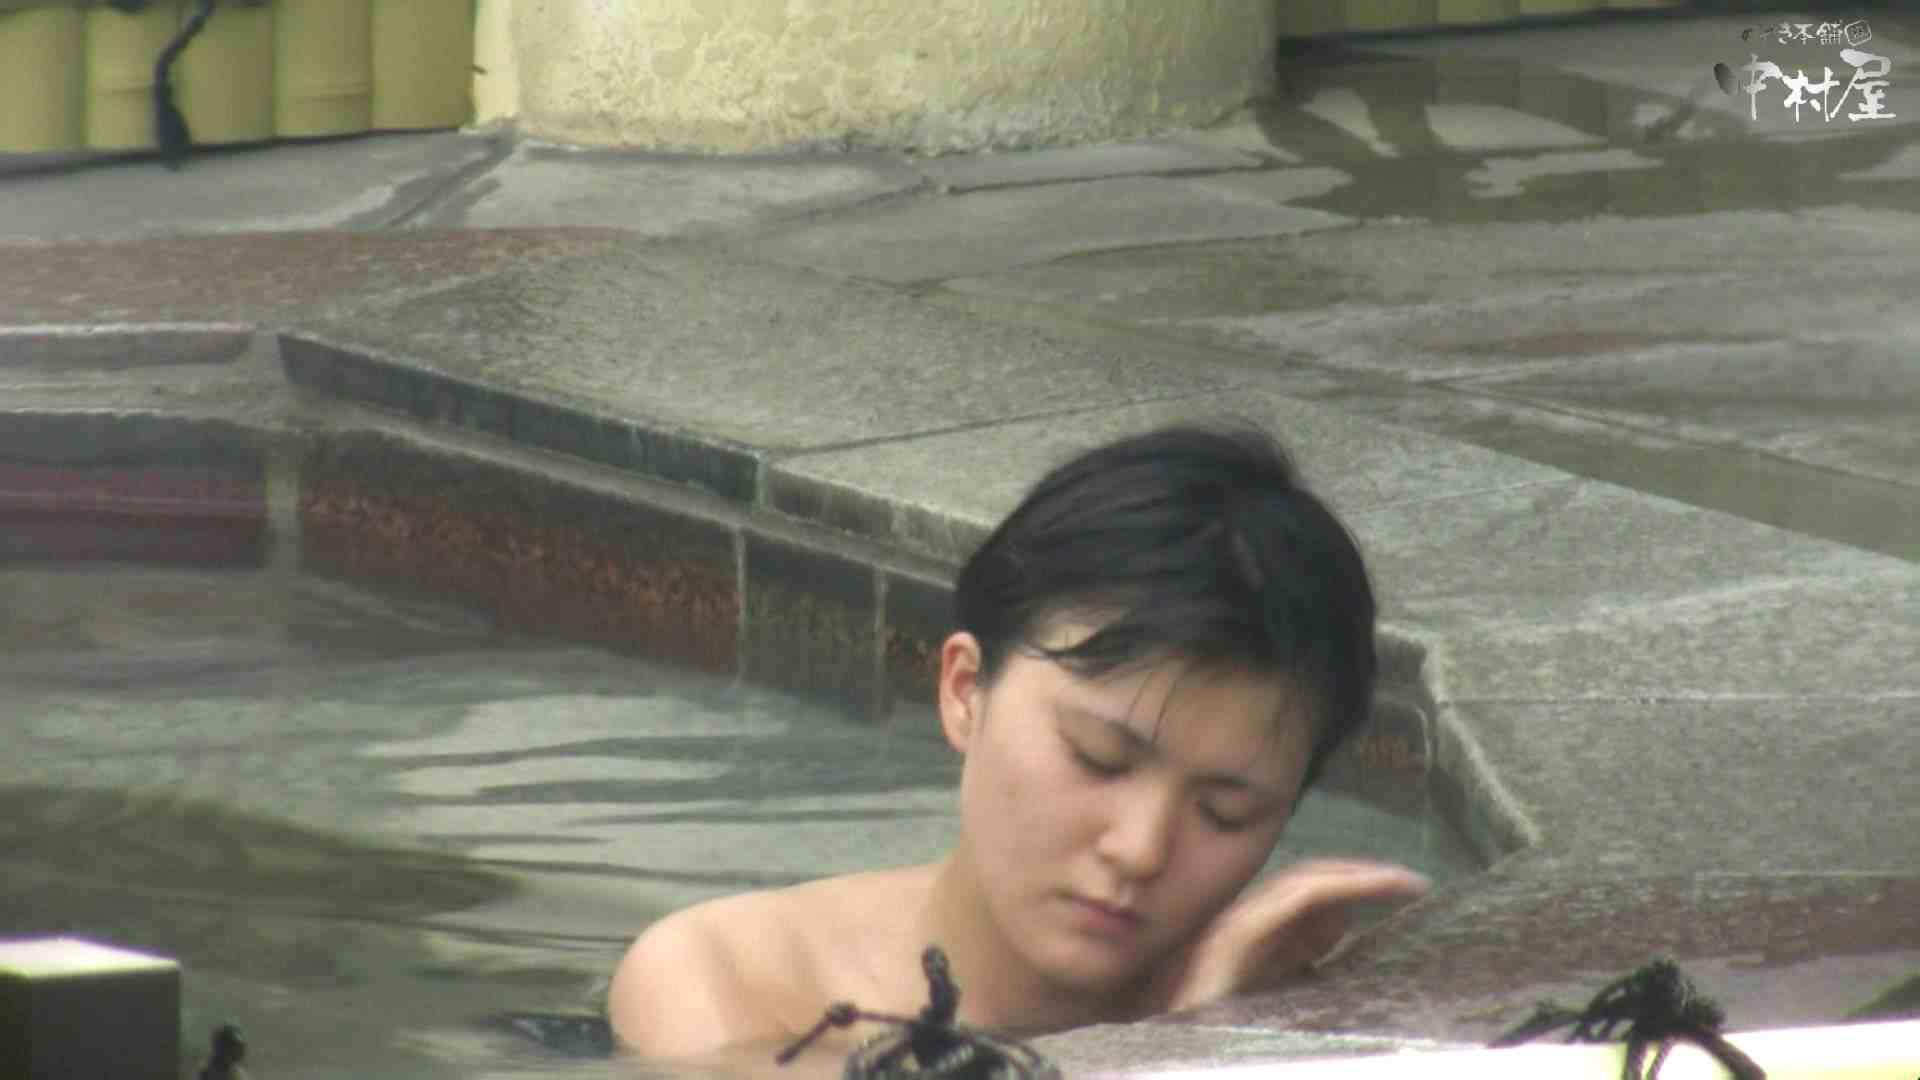 Aquaな露天風呂Vol.894 盗撮師作品 セックス画像 93pic 29